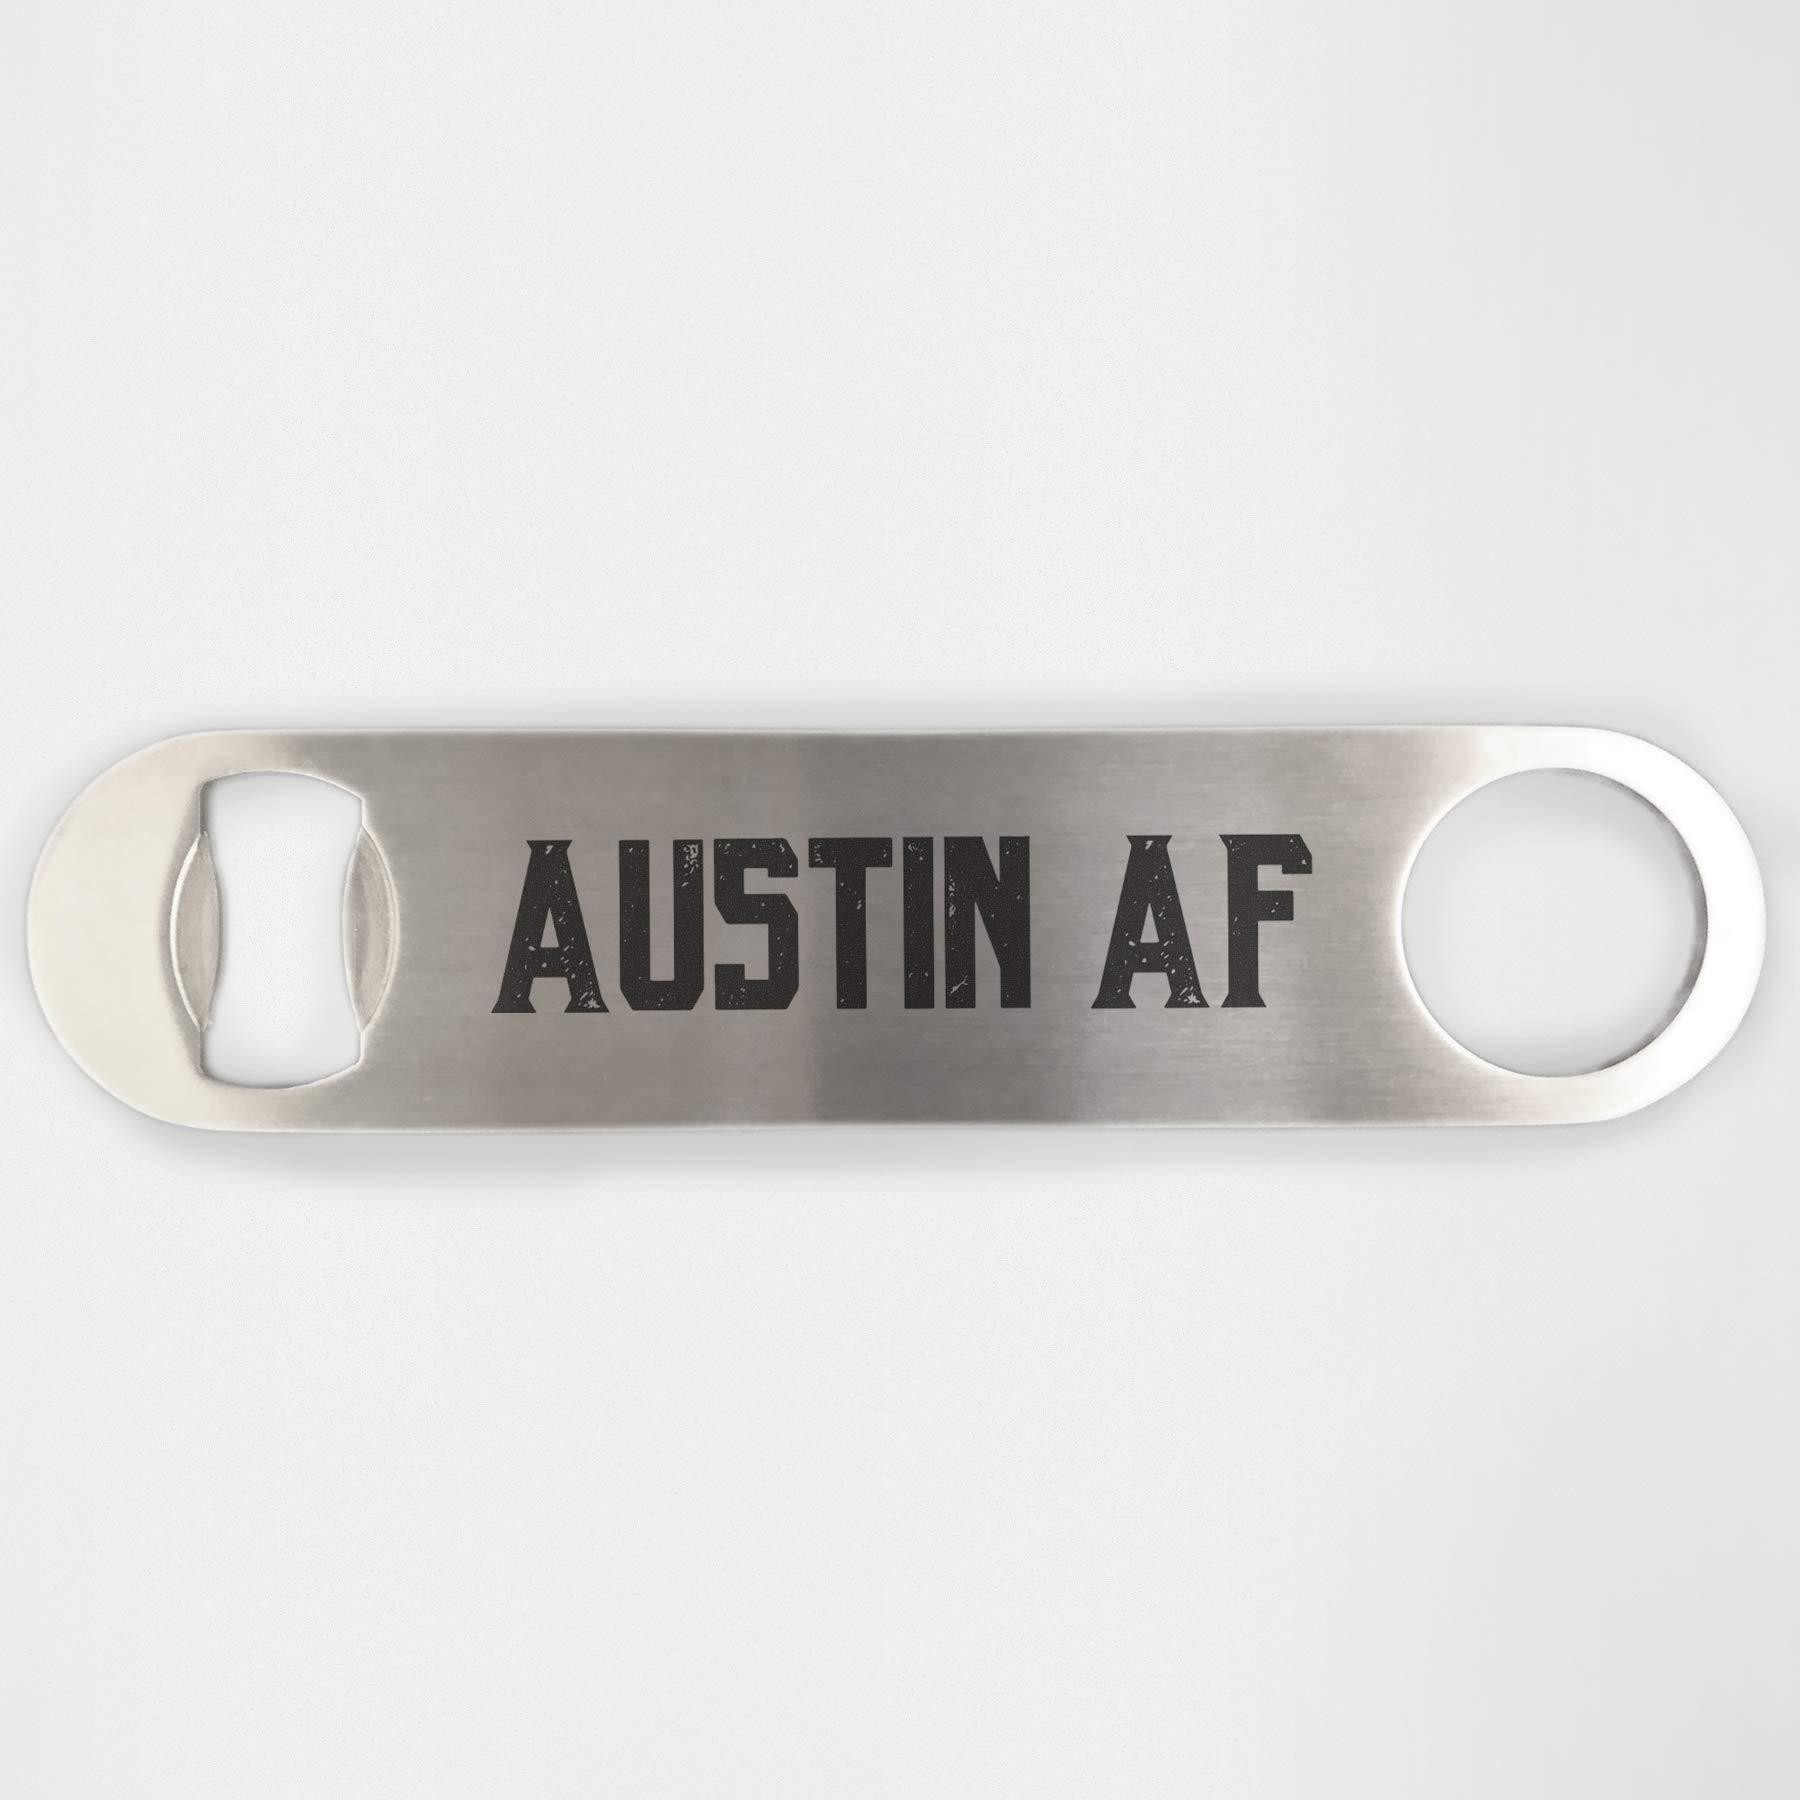 Austin Texas AF Stainless Steel Heavy Duty Flat Bar Key Beer Laser Etched Bottle Opener